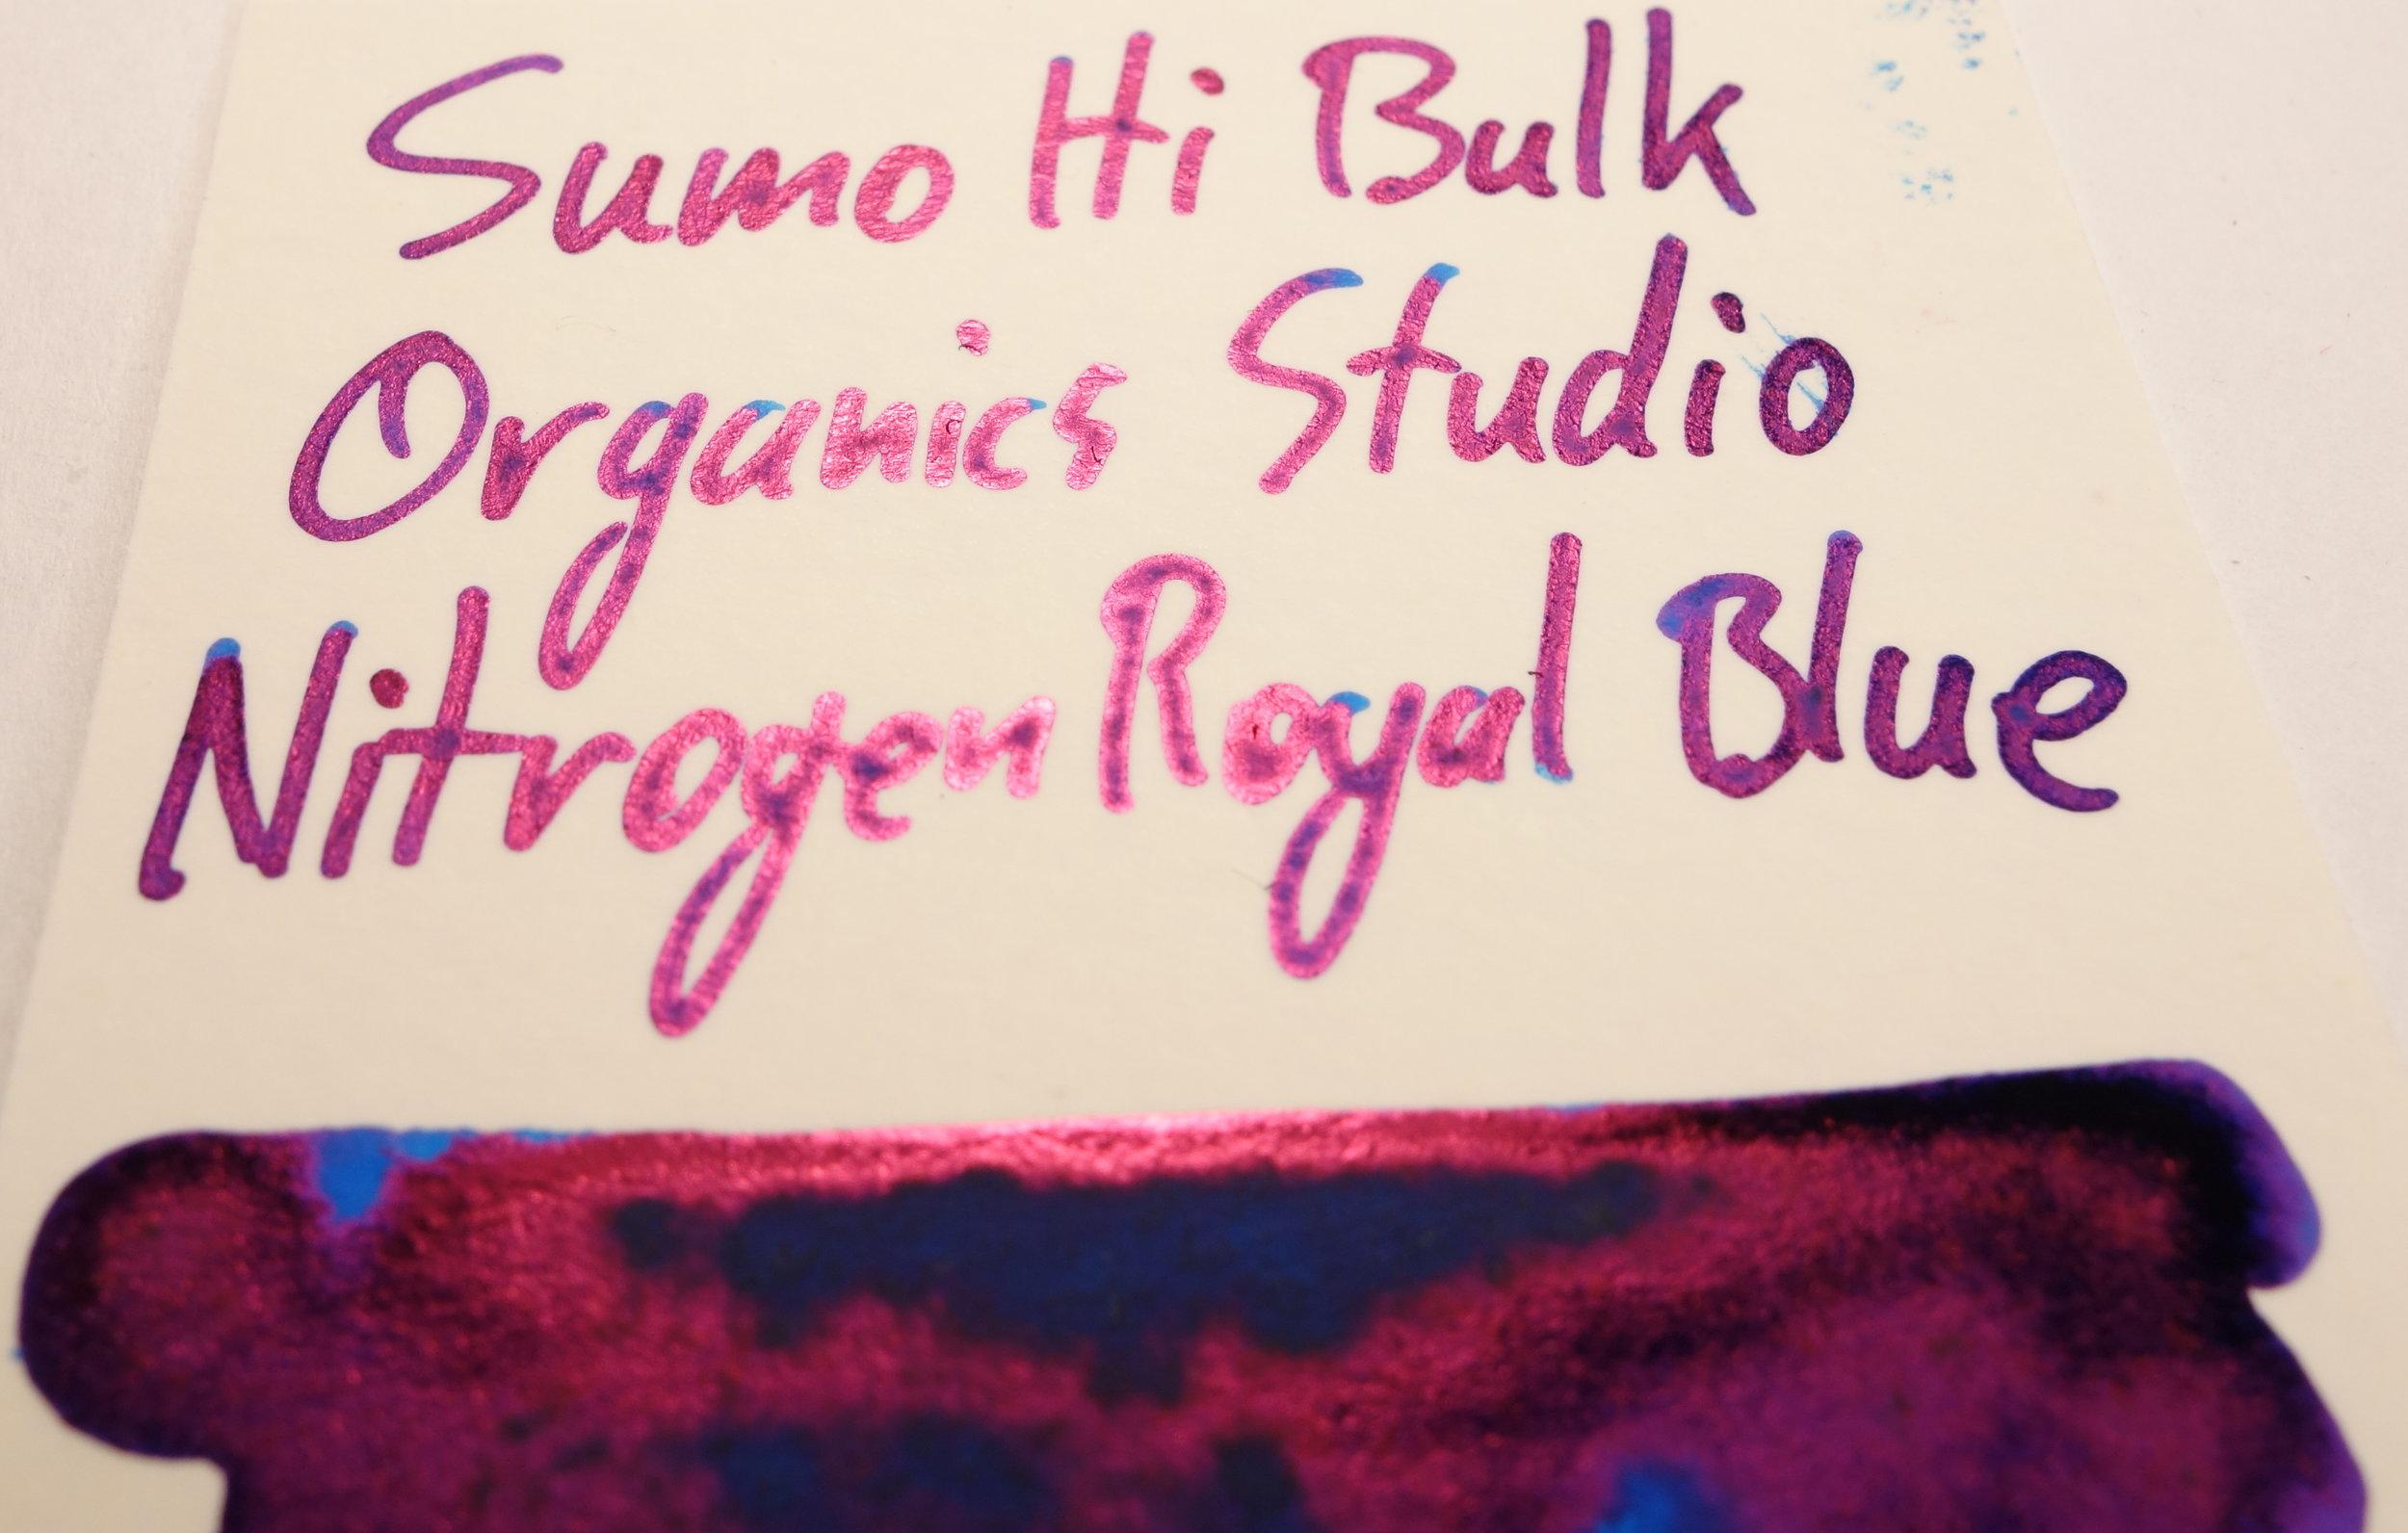 Organics Studio Nitrogen Royal Blue Sheen Sumo Hi Bulk.JPG